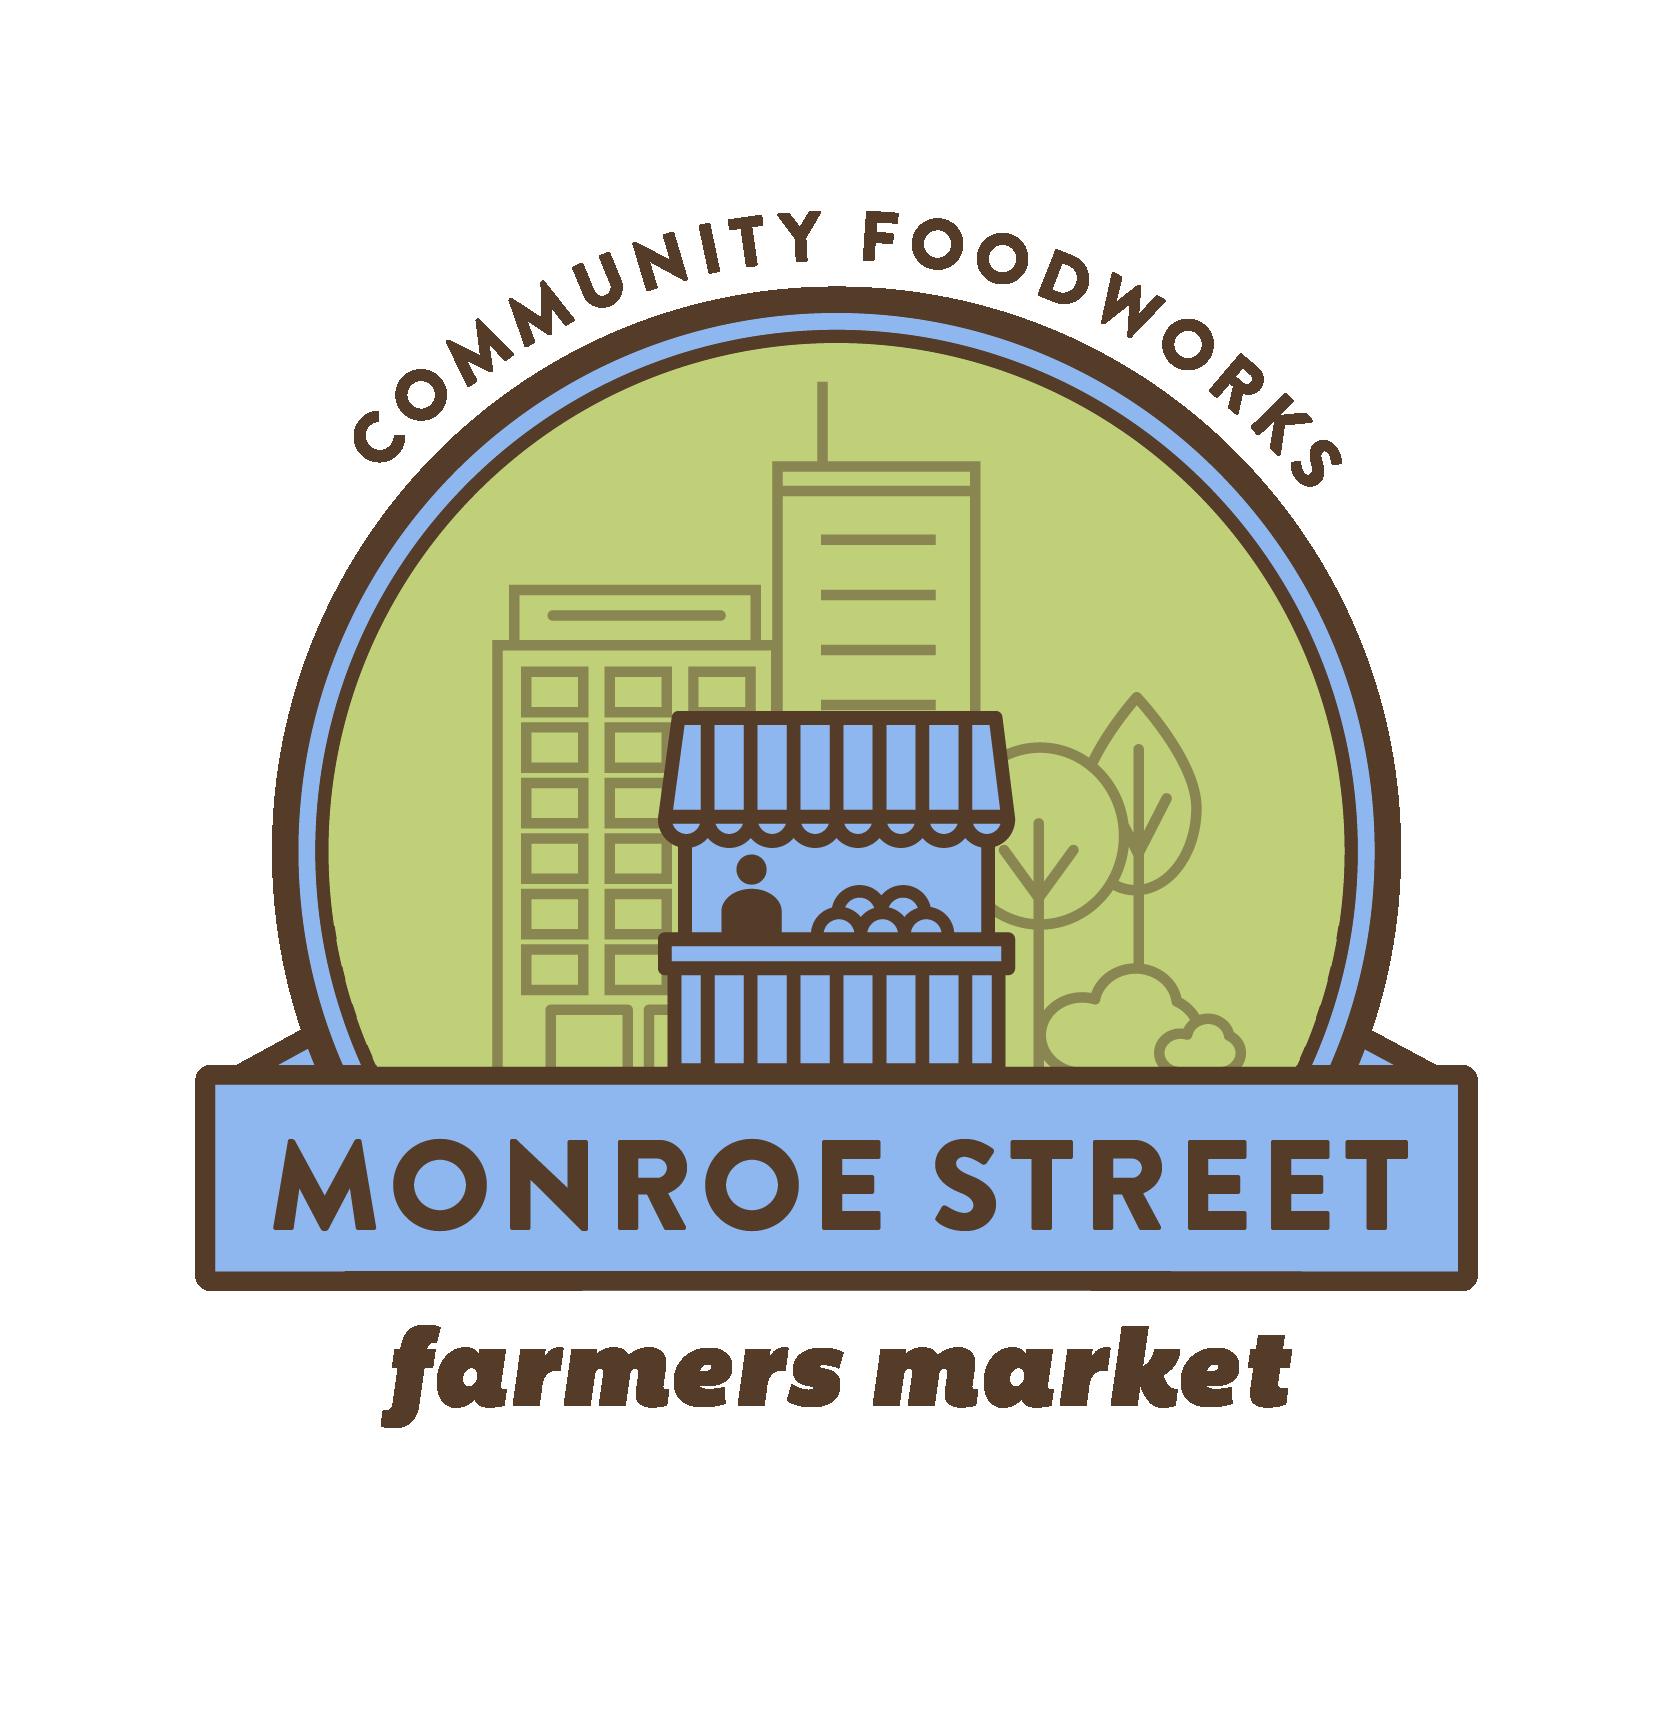 CFW_Farmers-Markets_MonroeStreet.png